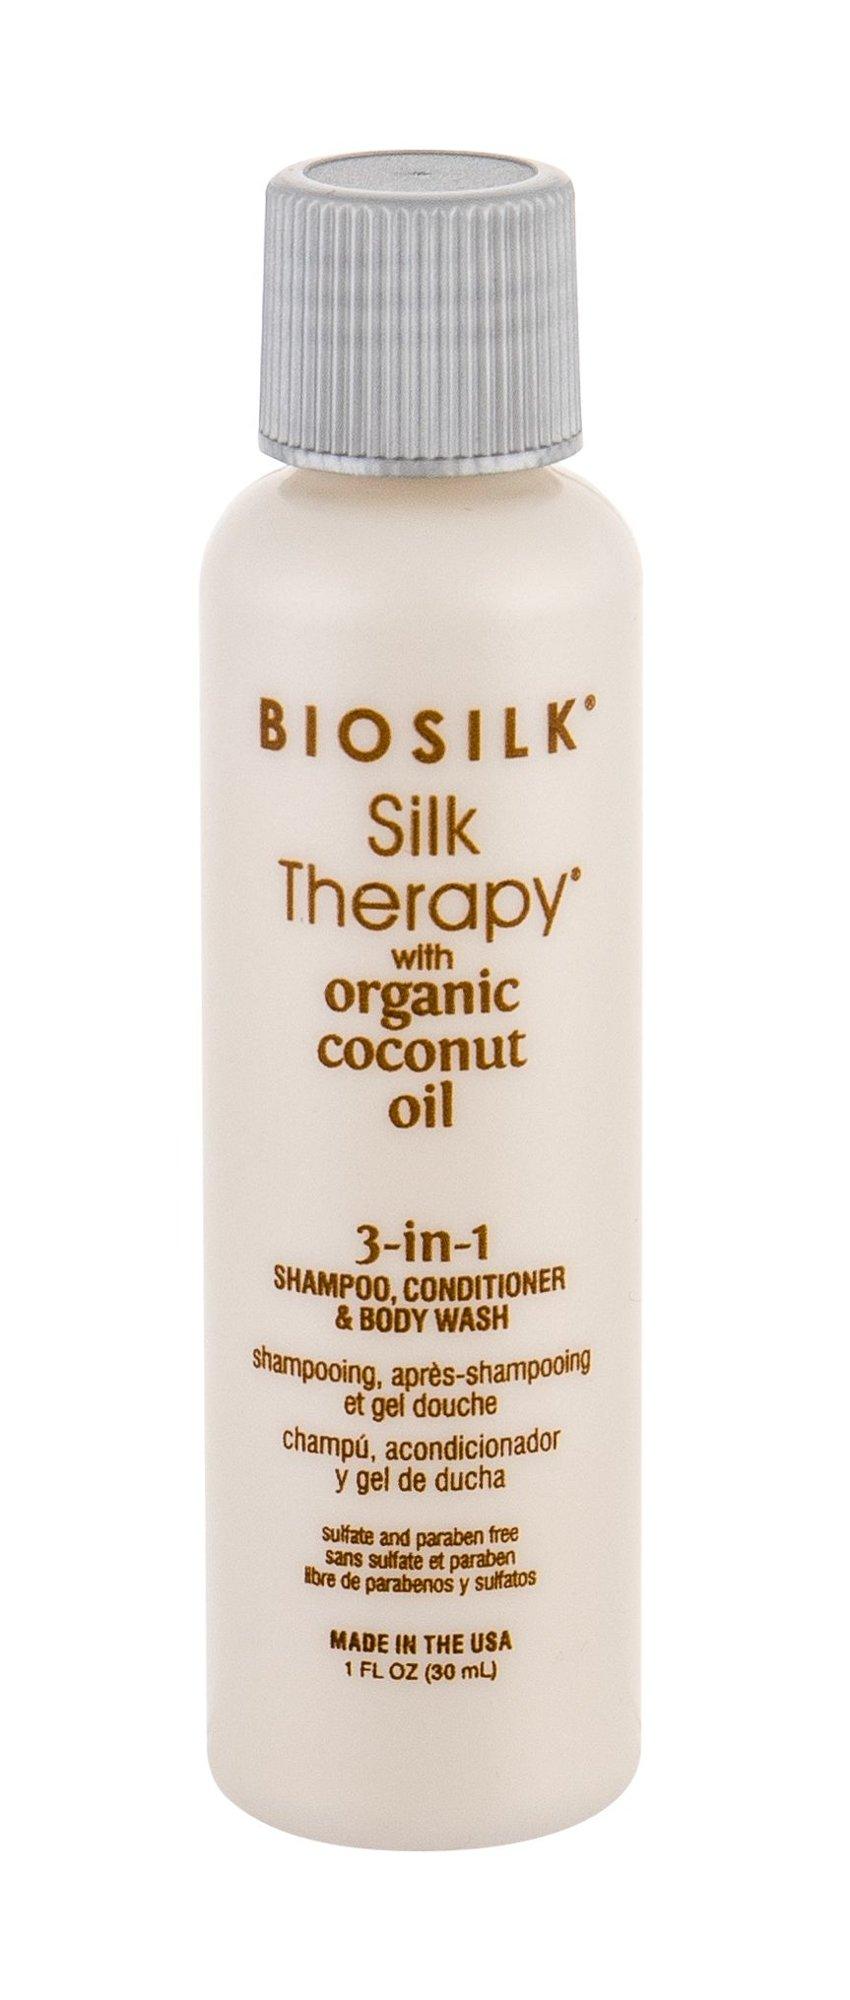 Farouk Systems Biosilk Silk Therapy Shampoo 30ml